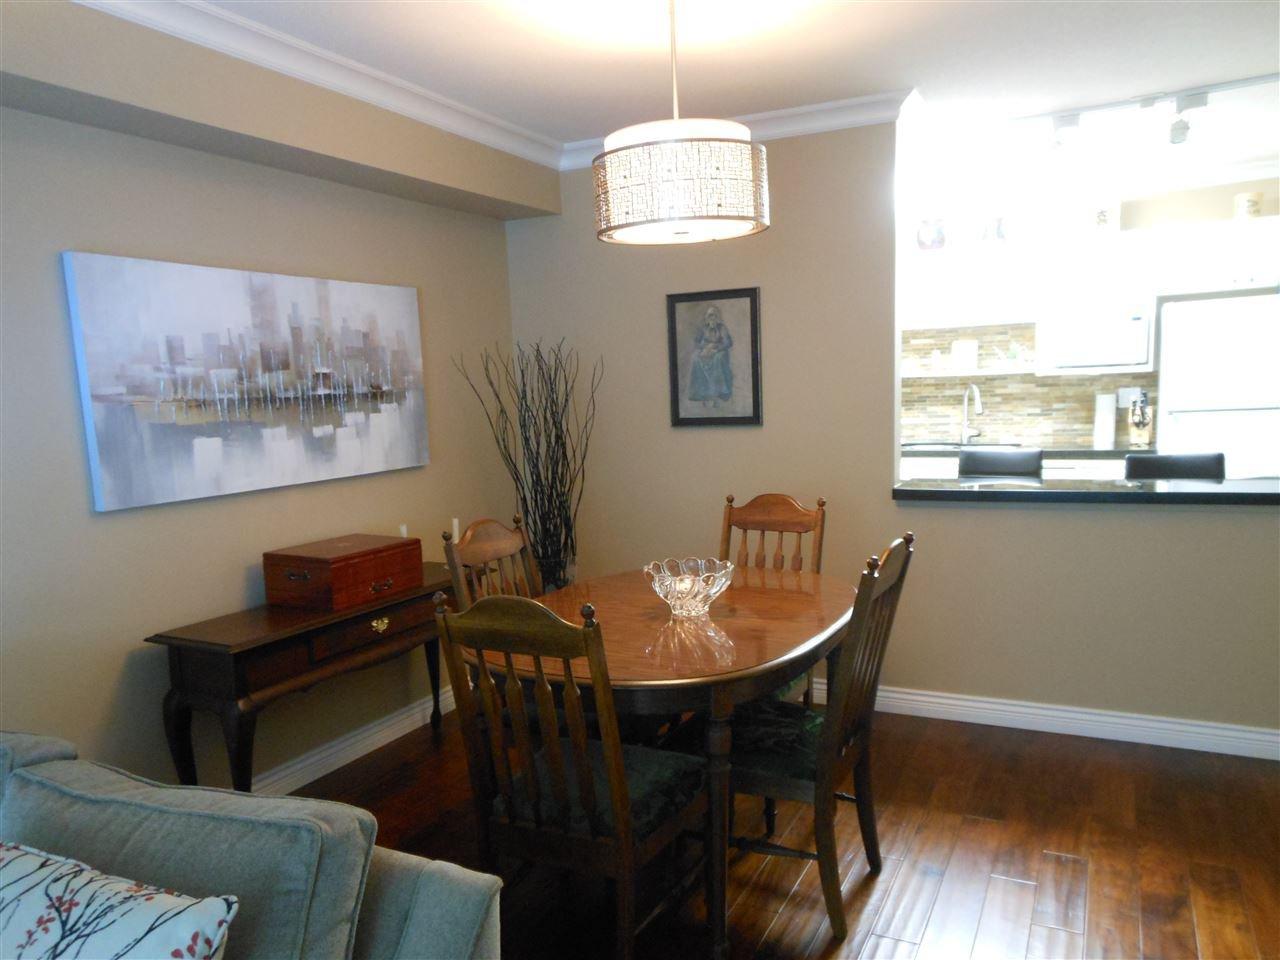 Photo 3: Photos: 206 15140 29A AVENUE in Surrey: King George Corridor Condo for sale (South Surrey White Rock)  : MLS®# R2089187